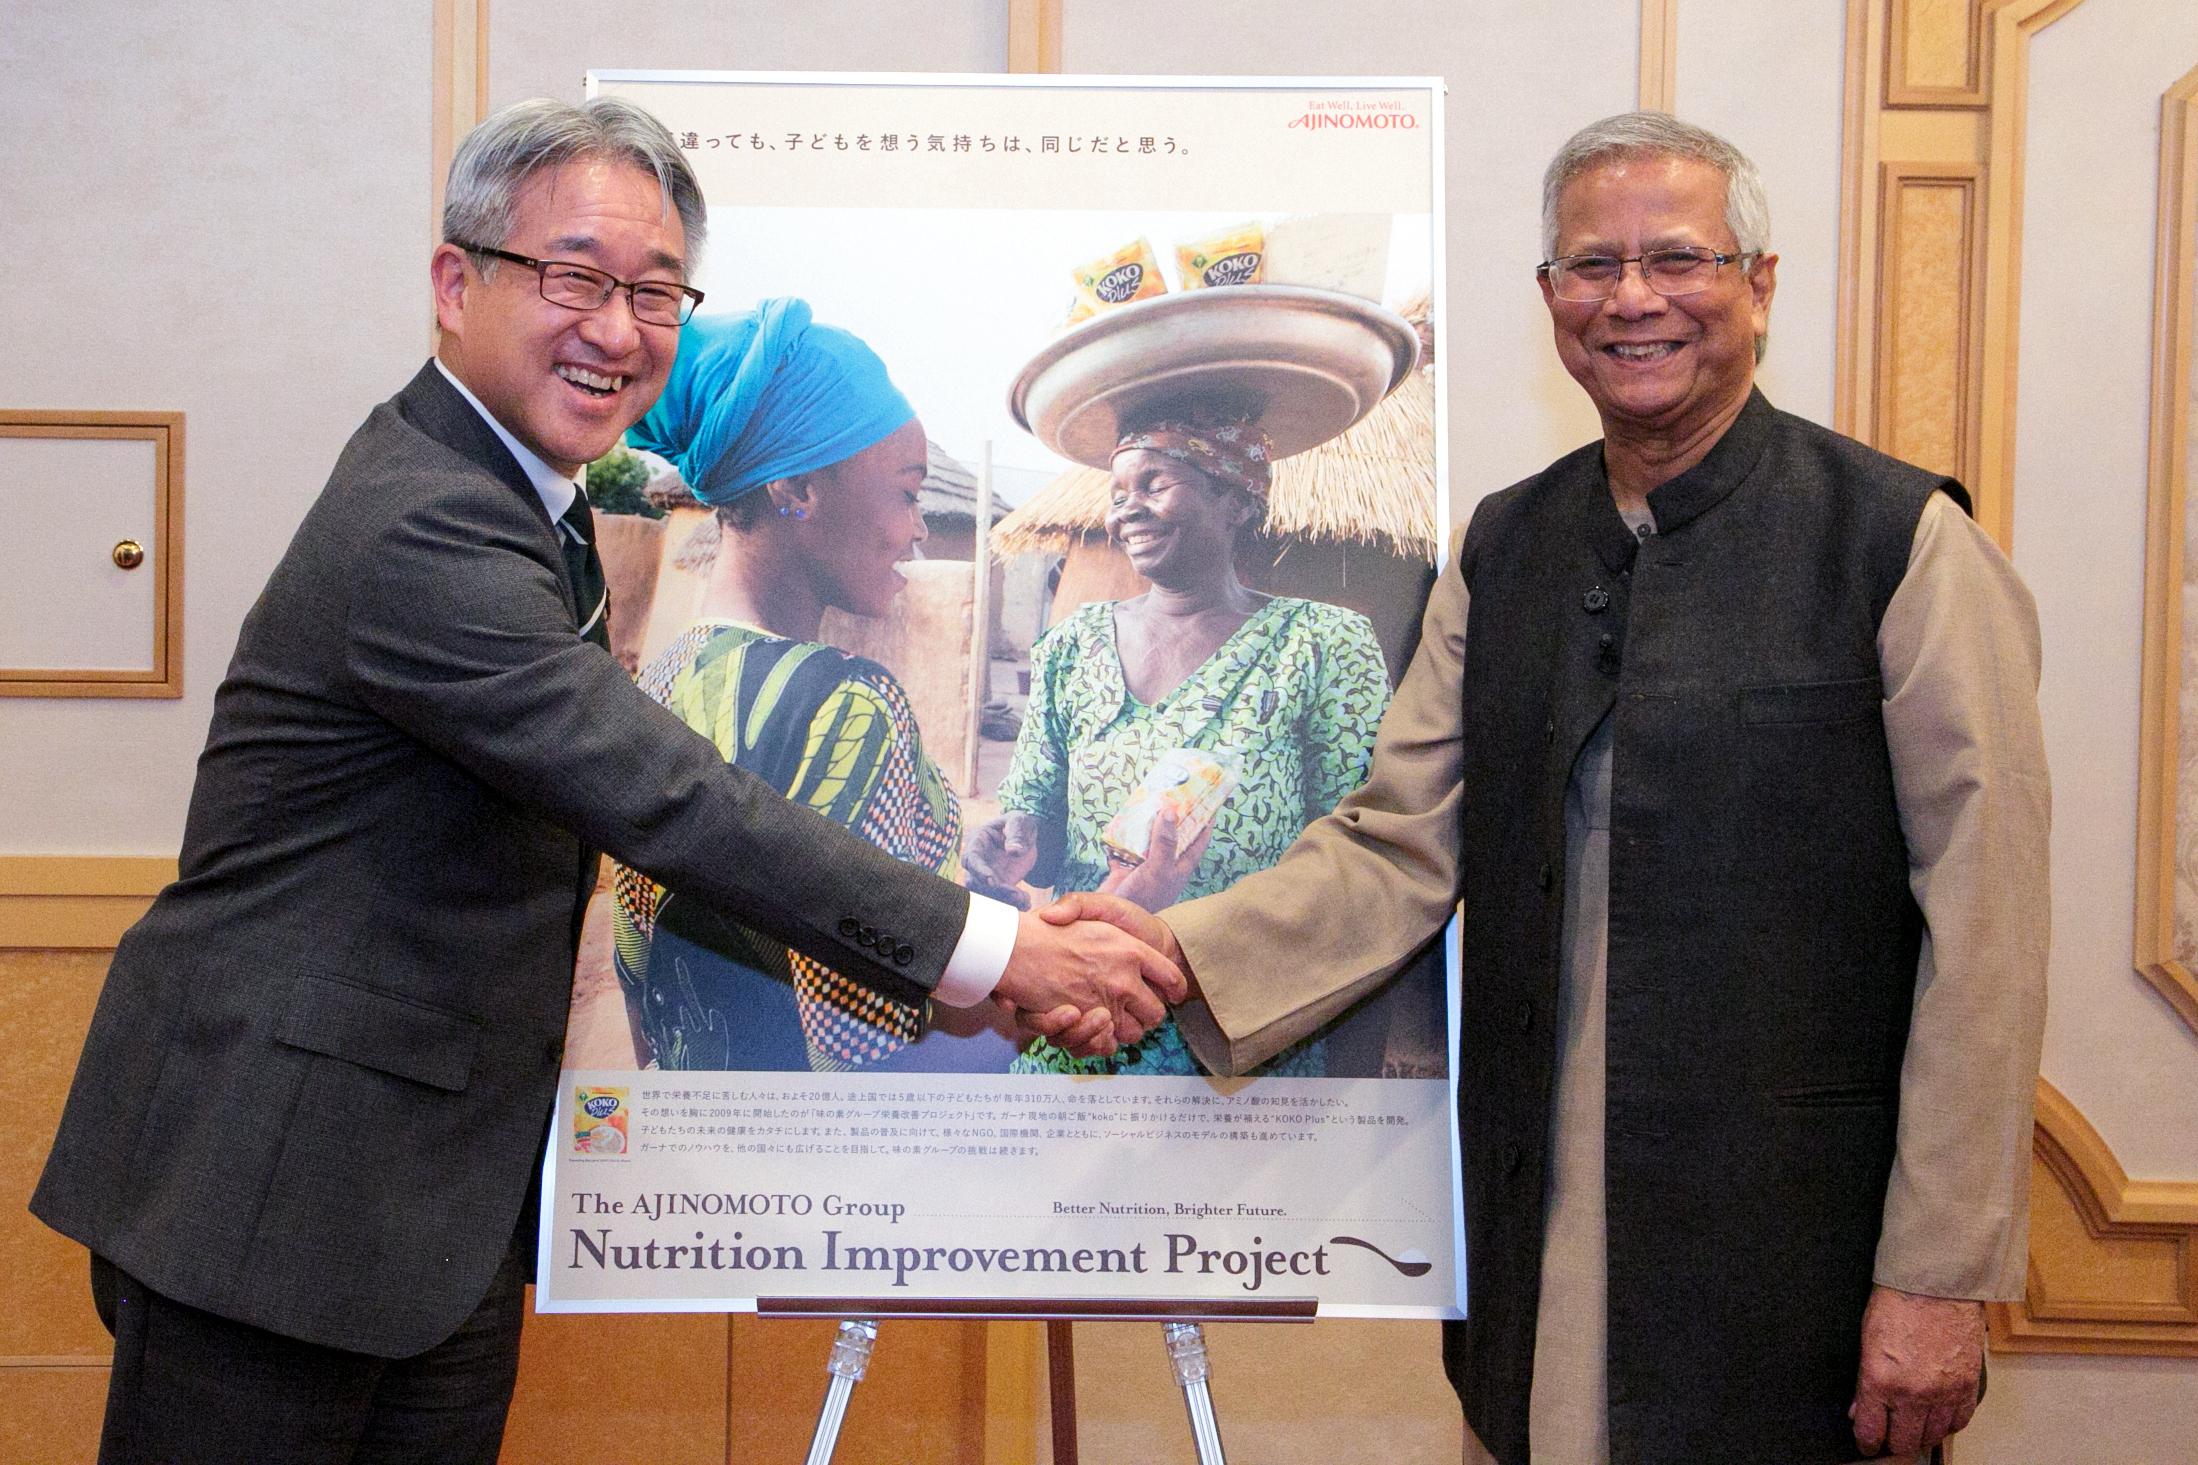 Ajinomoto CEO Nishii and Prof. Yunus (Photo: Business Wire)